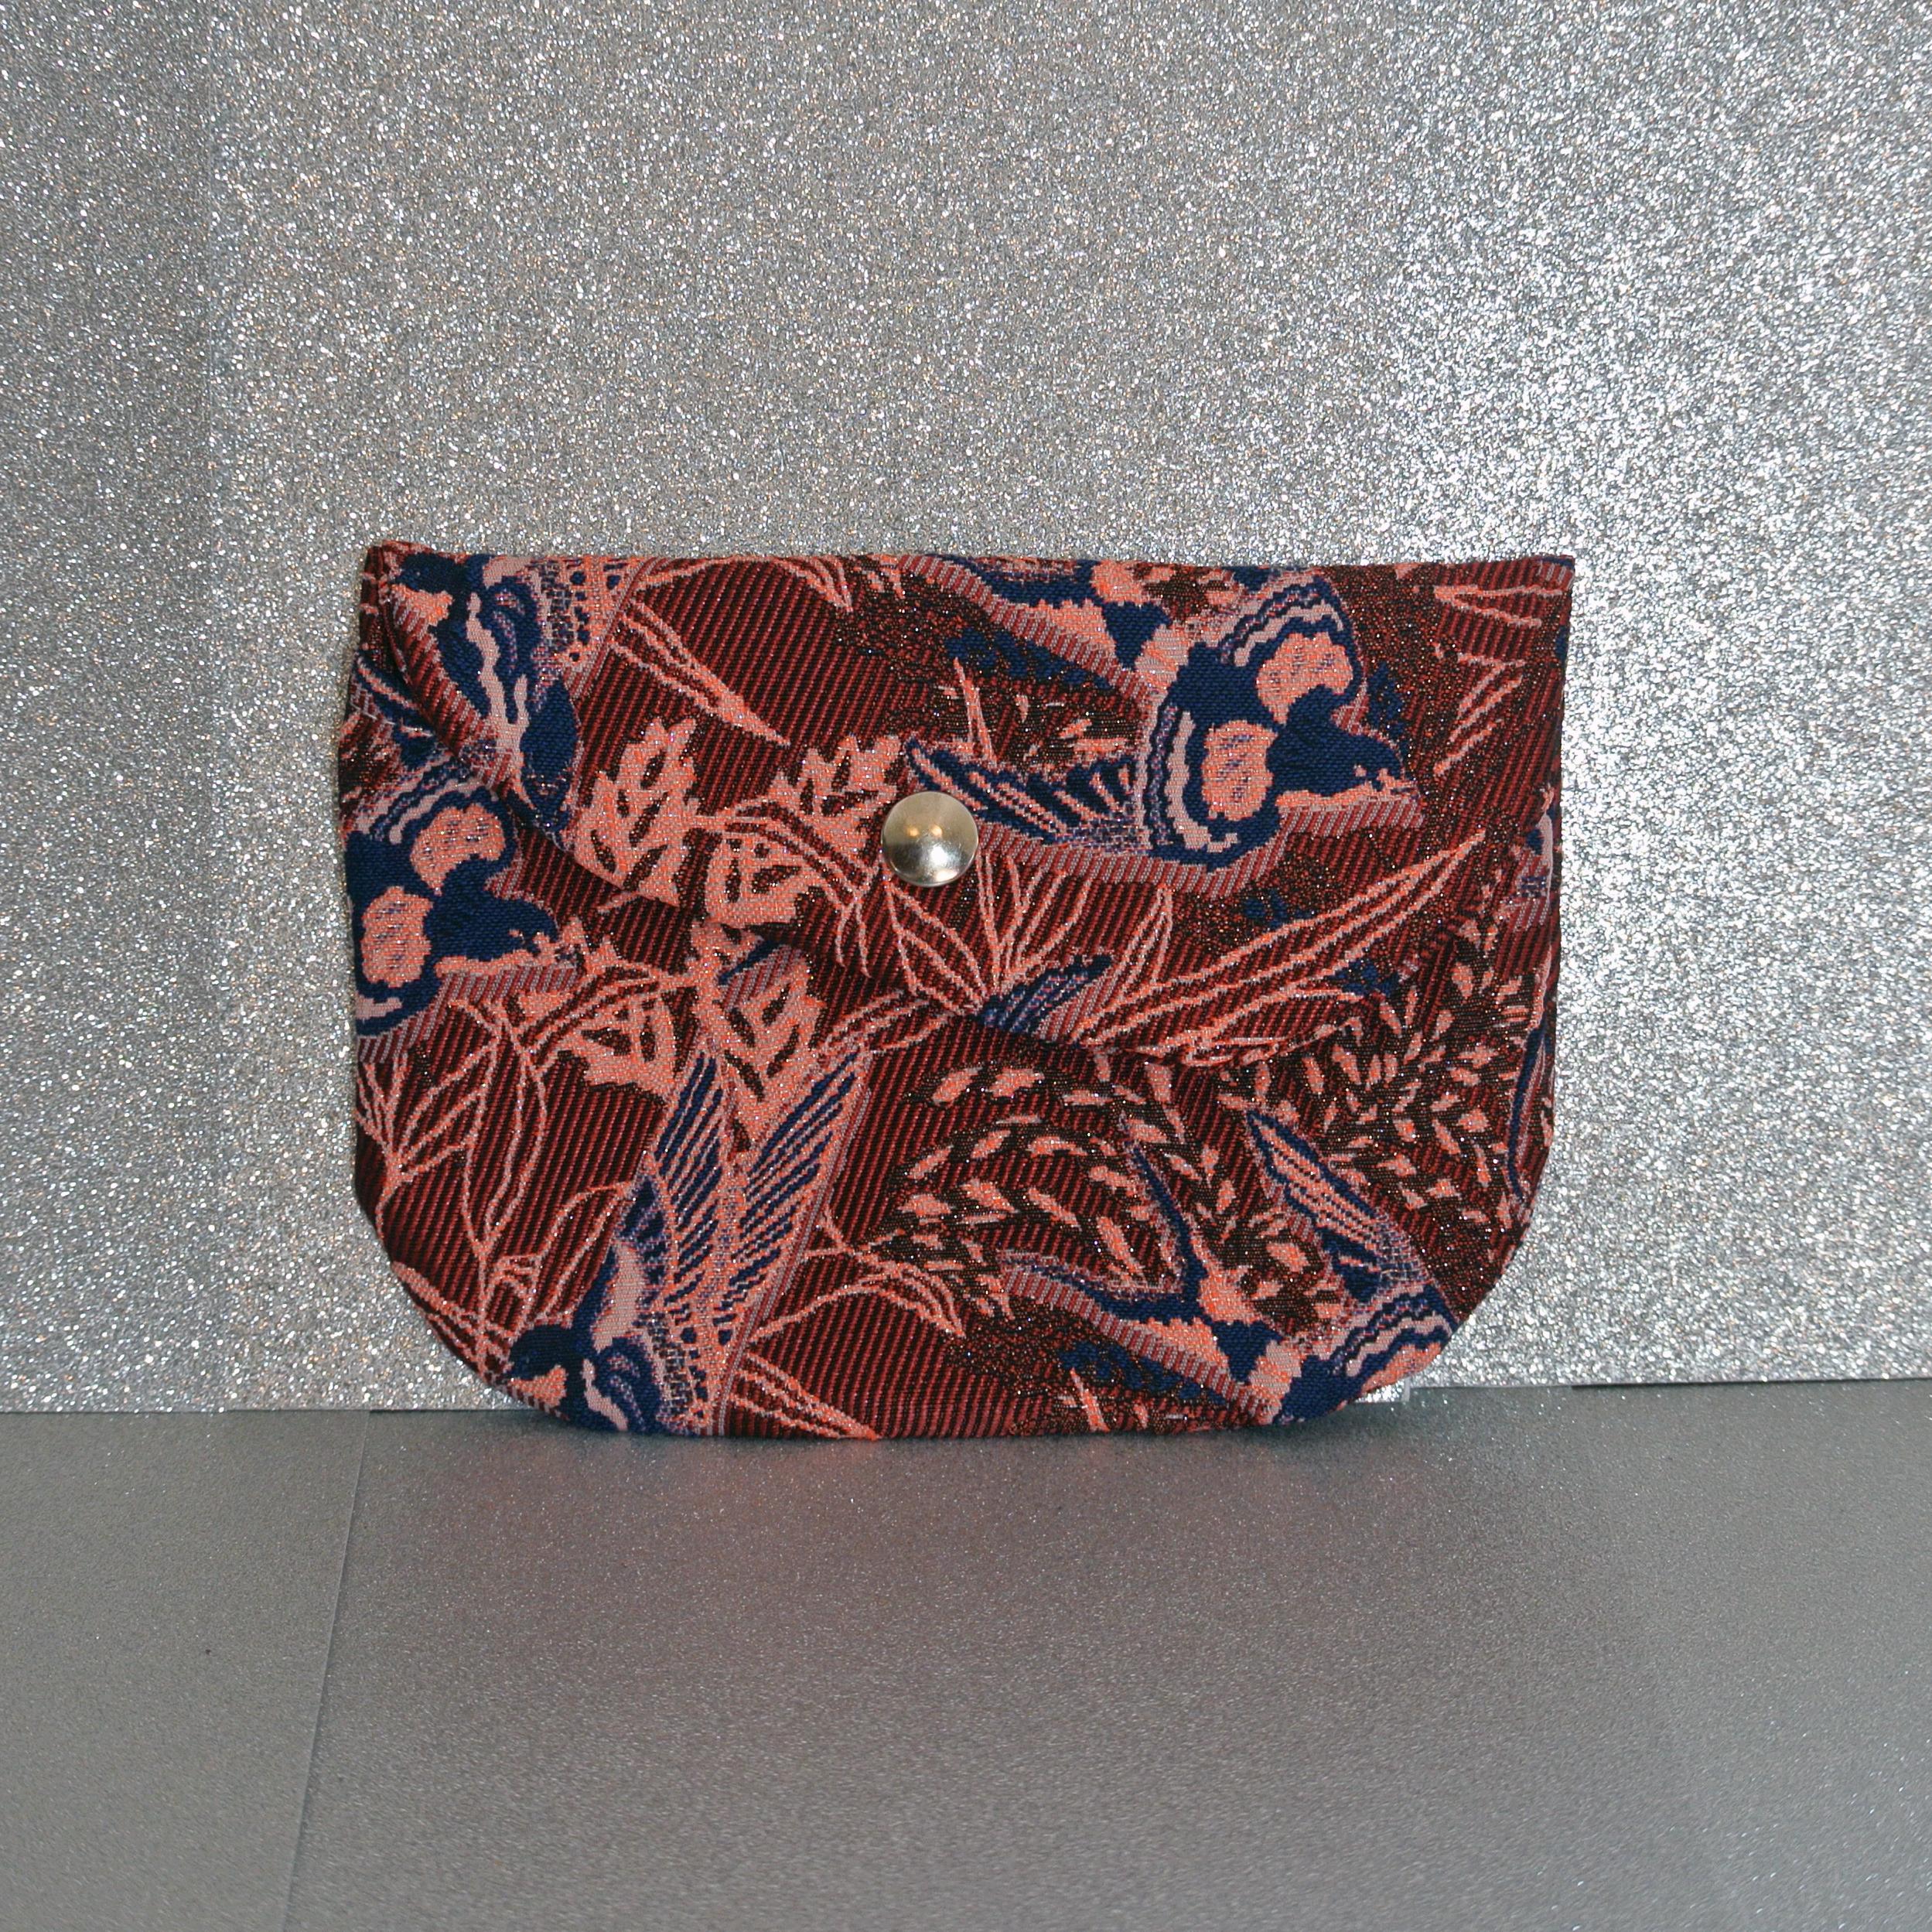 pochette pluton en jacquard, made in france, la cartabliere